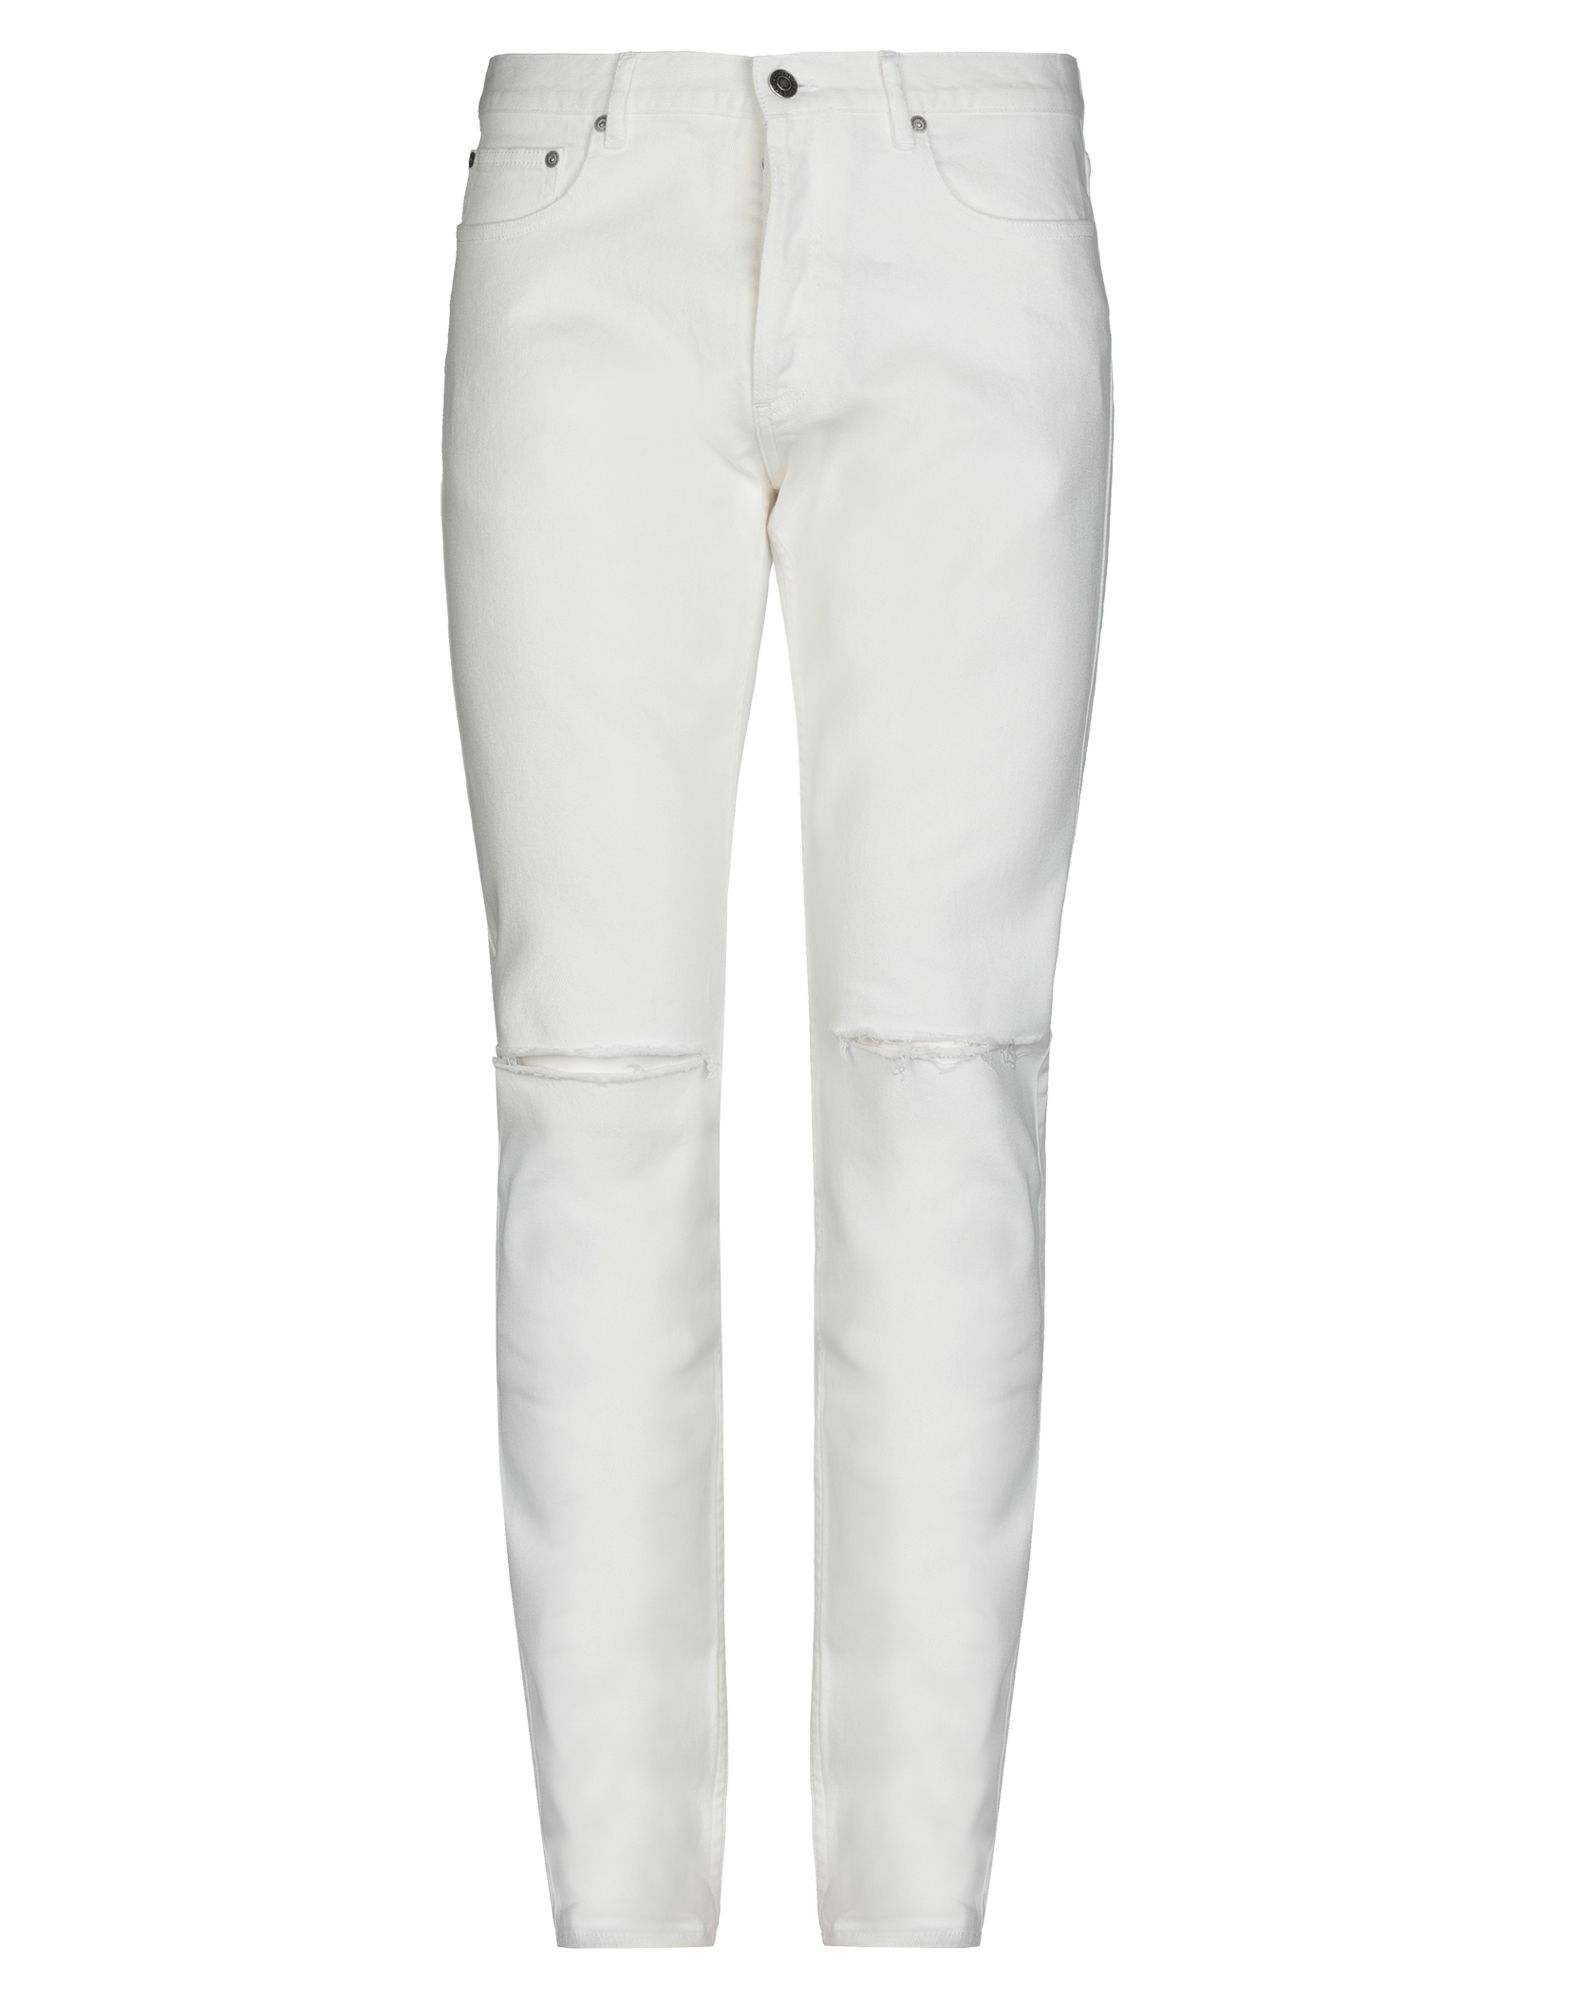 GIVENCHY Denim pants - Item 42808430